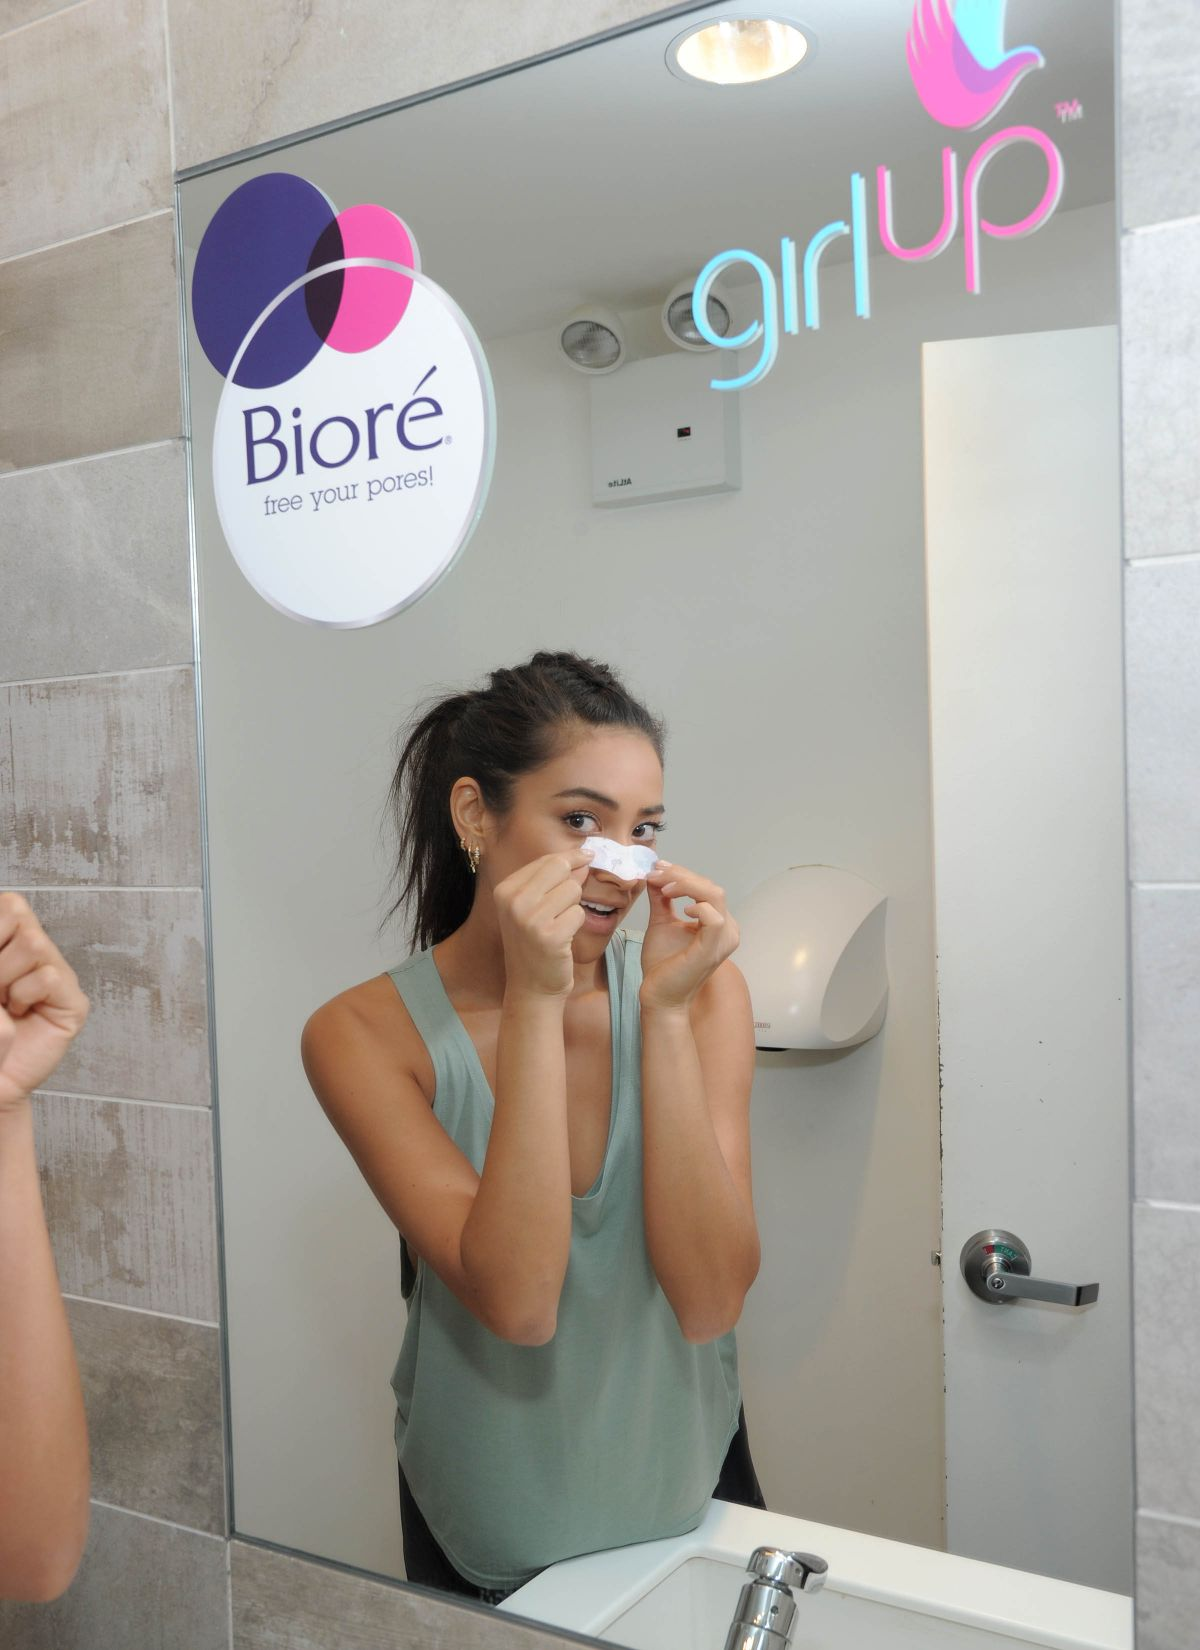 biore-girl-up 2.jpg